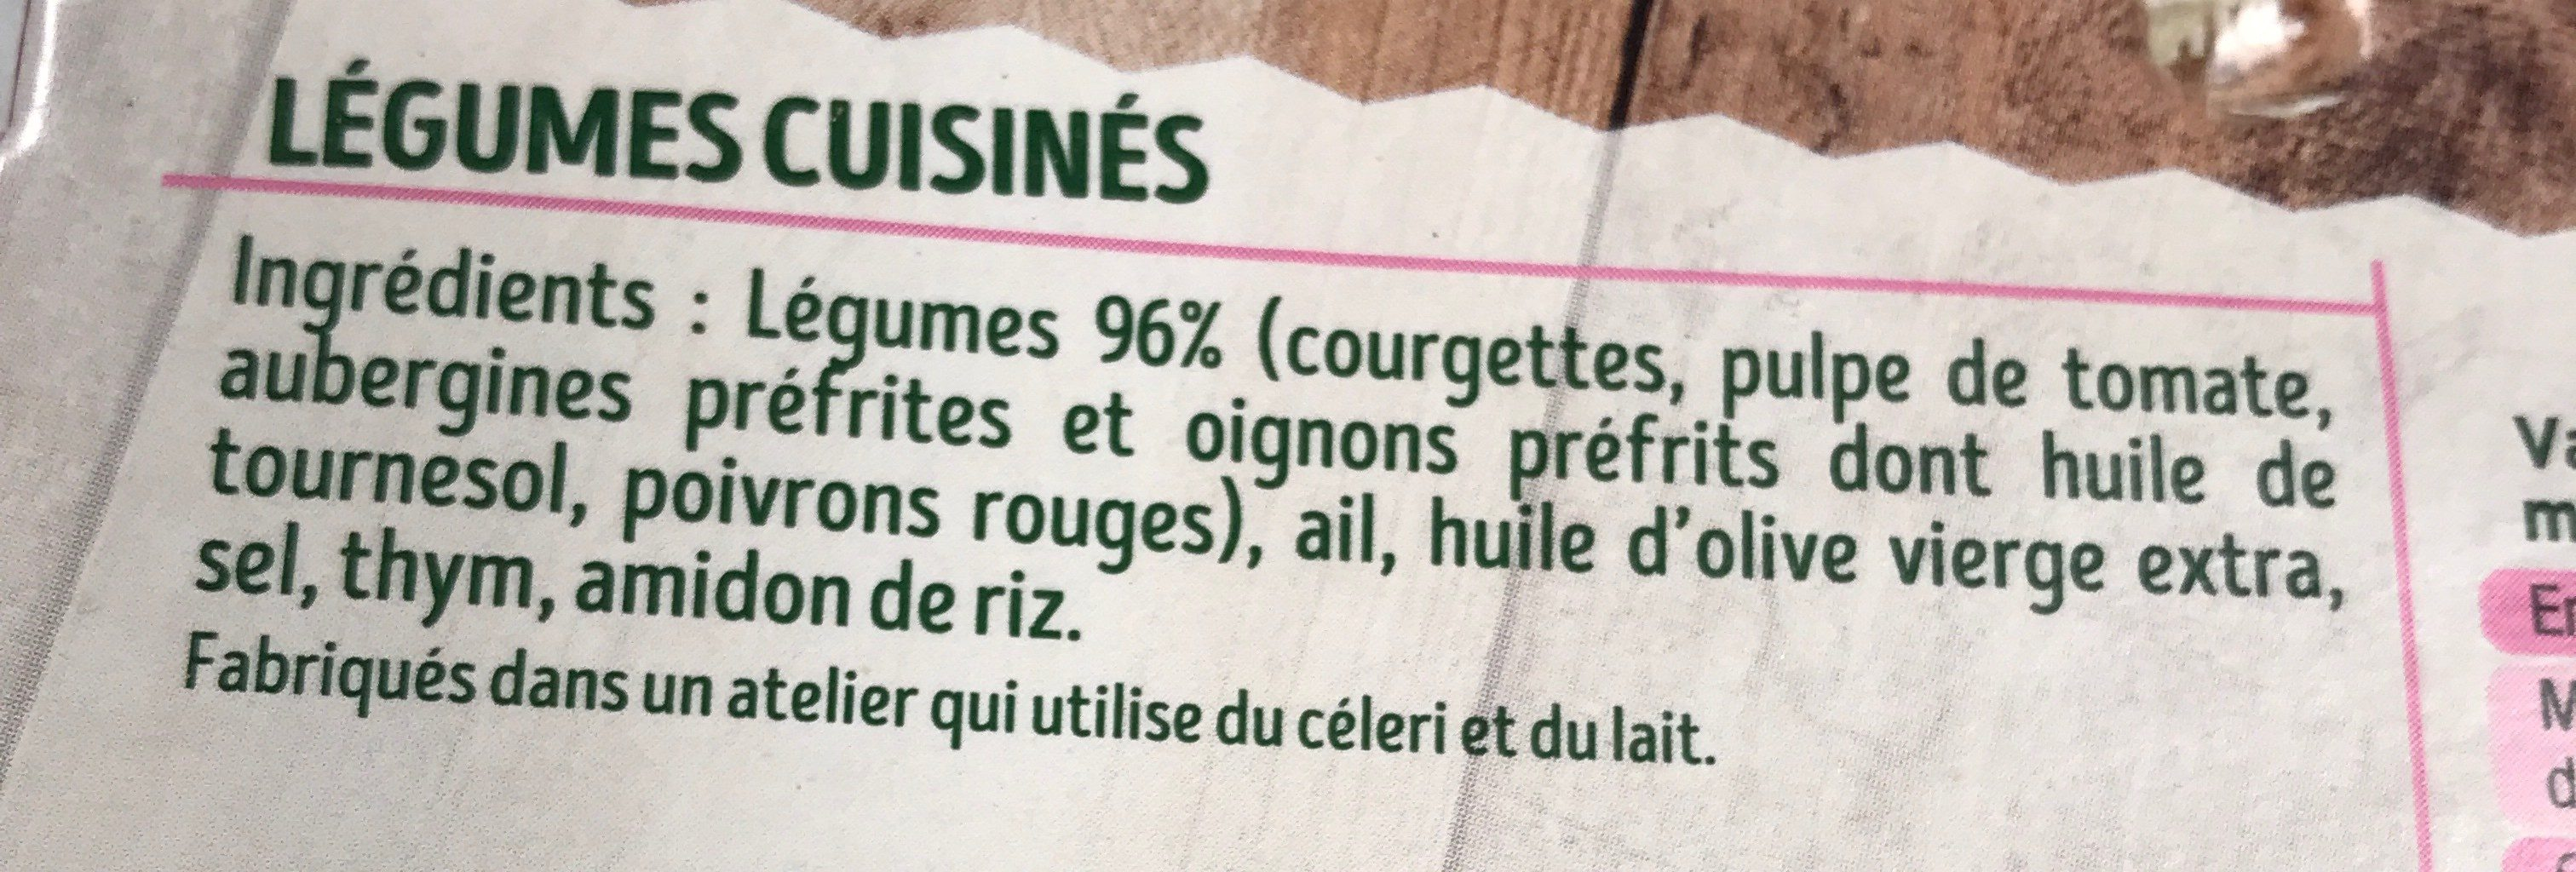 Ratatouille mijotee - Ingrédients